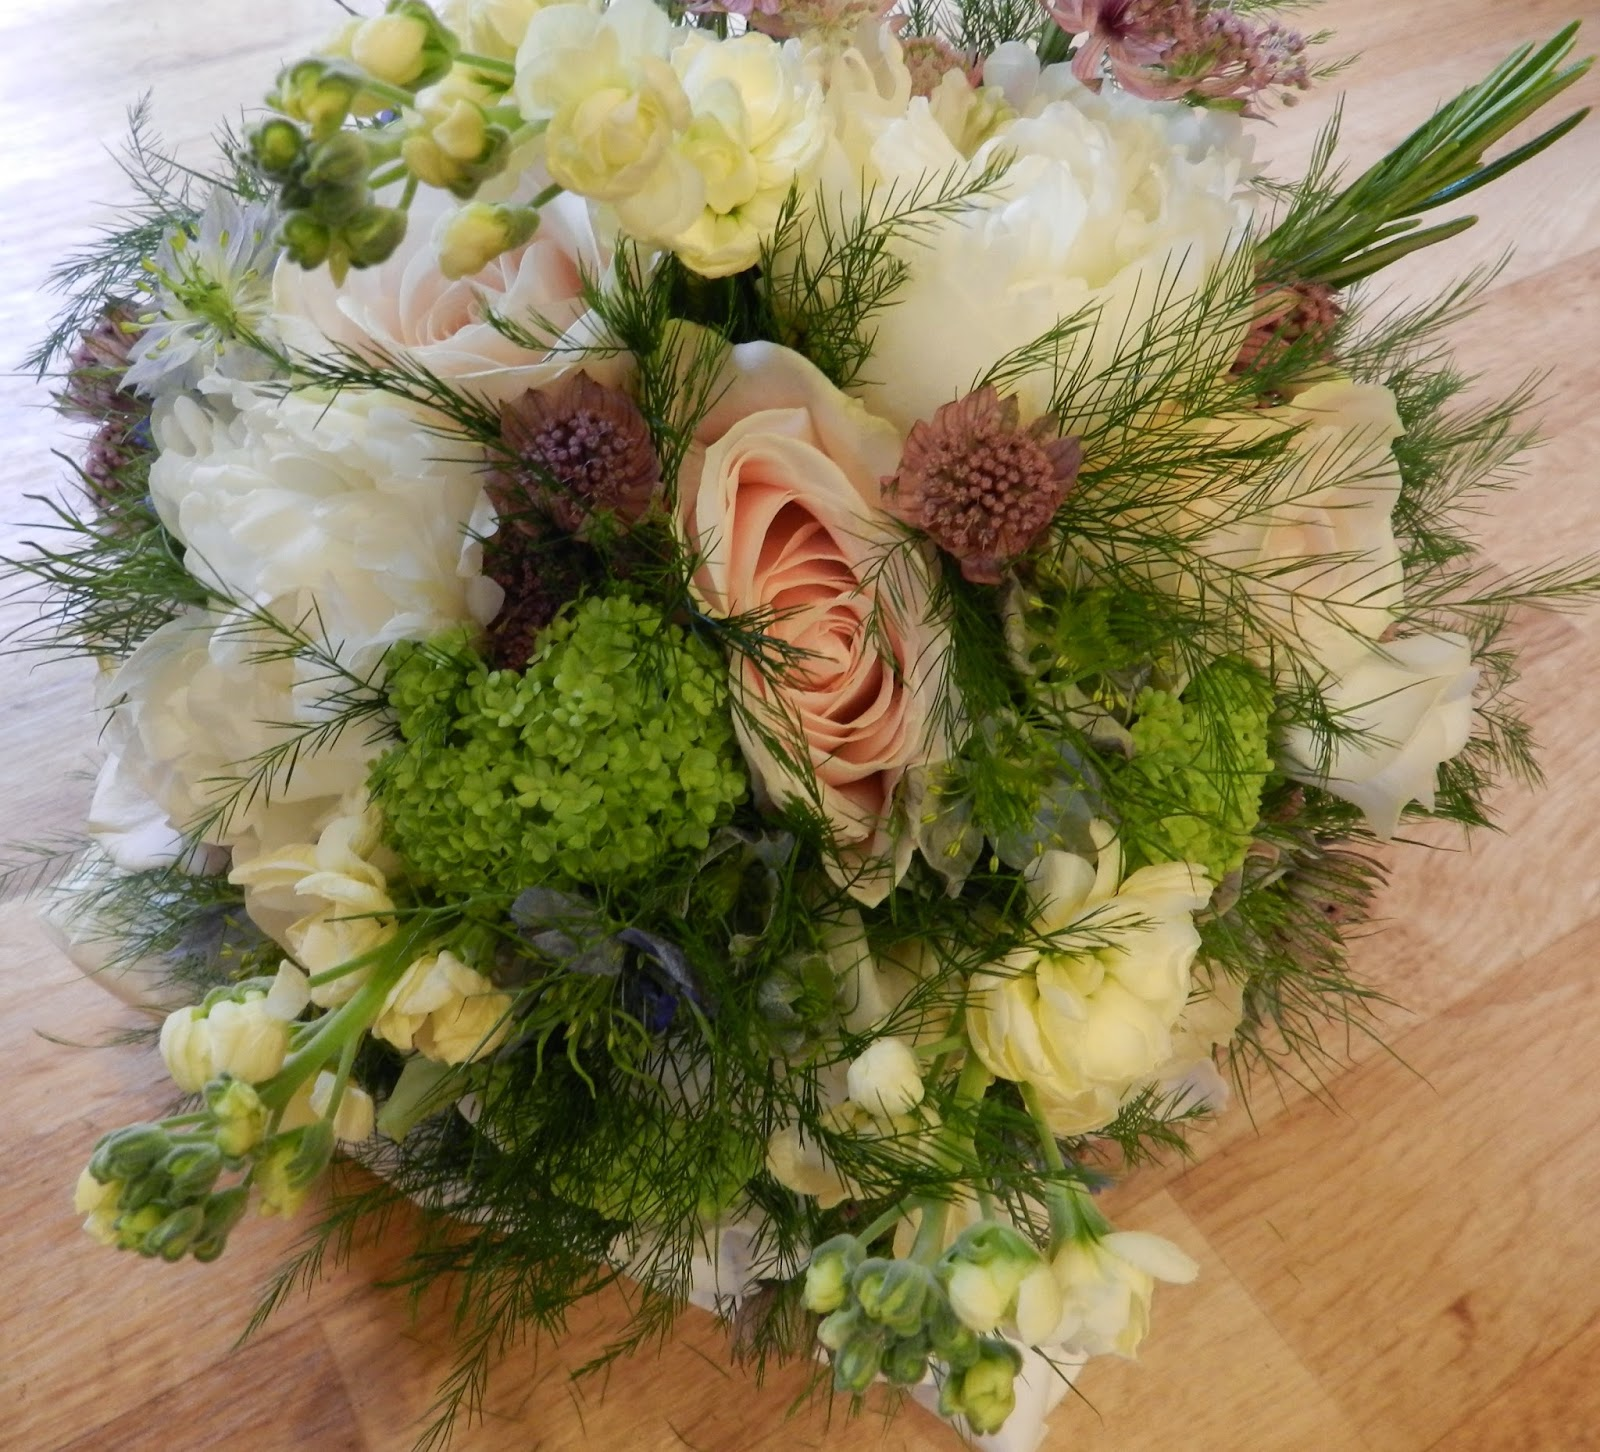 Summer Wedding Flowers: Sandra's Flower Studio: Vintage Summer Wedding Flowers